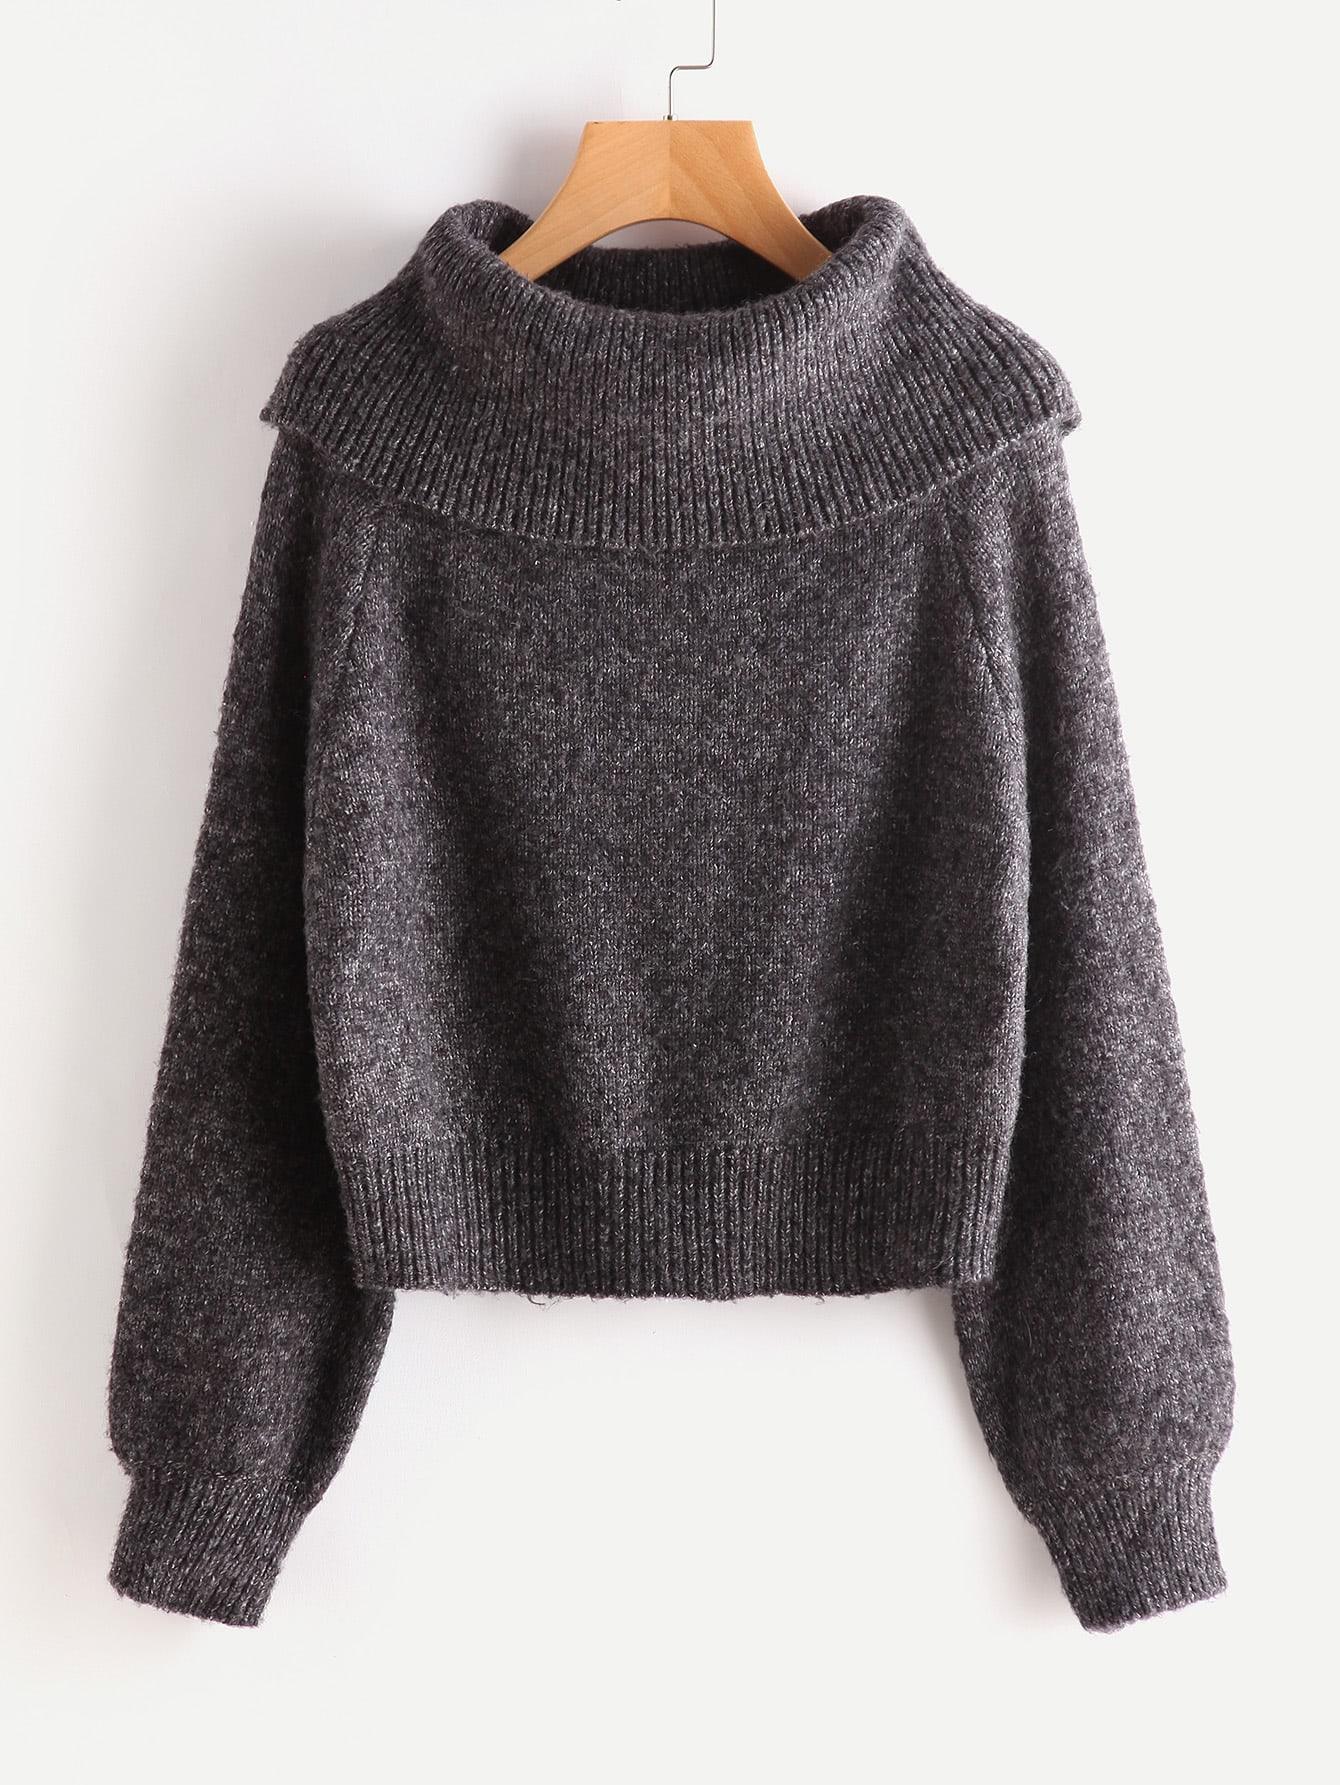 Oversized Turtle Neck Marled Knit Jumper two tone marled knit jumper